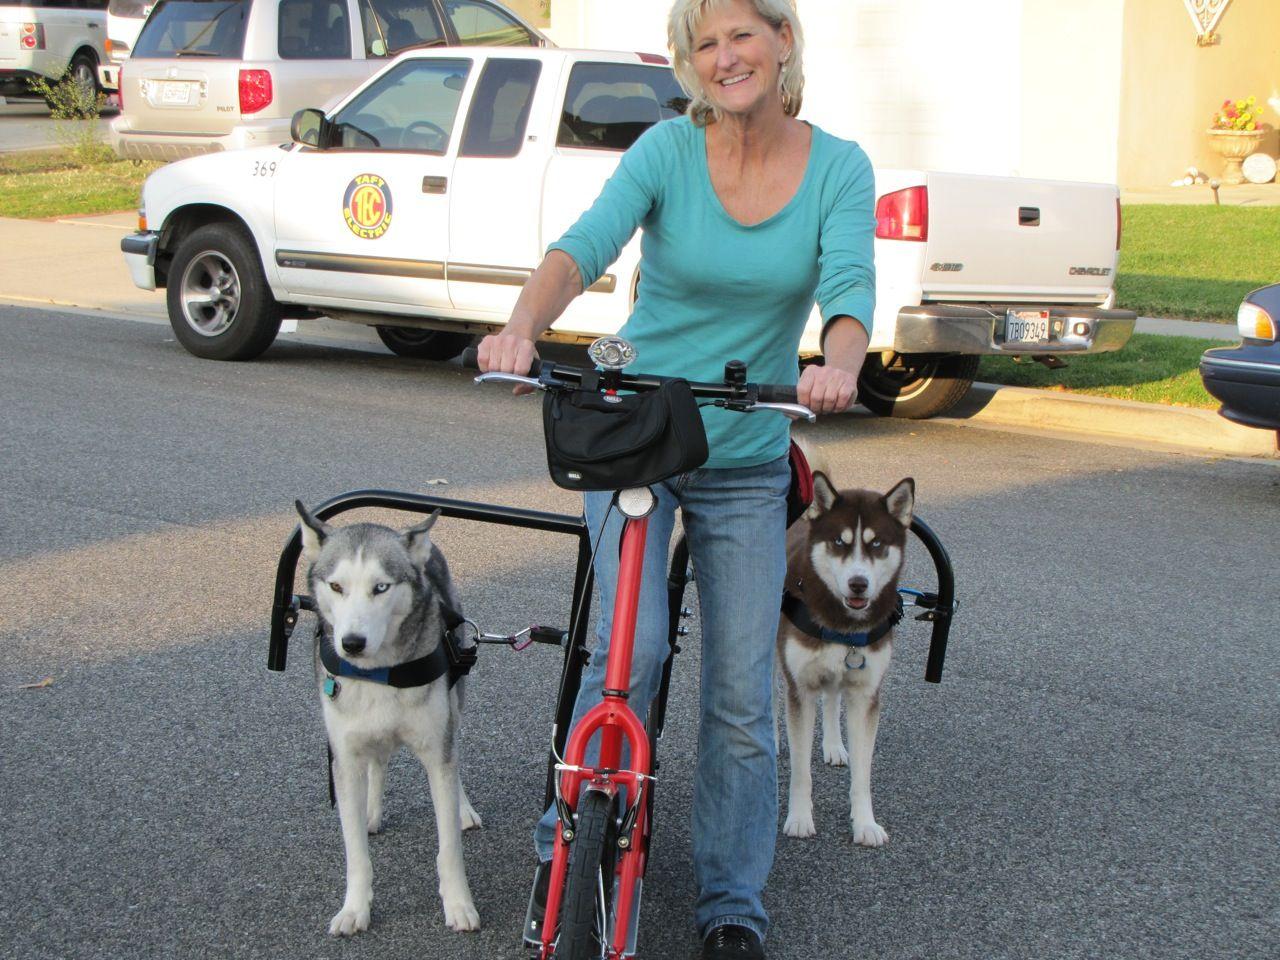 Pin By Eduardo Hanks On Dogdom Pets Dogs Dog Sledding